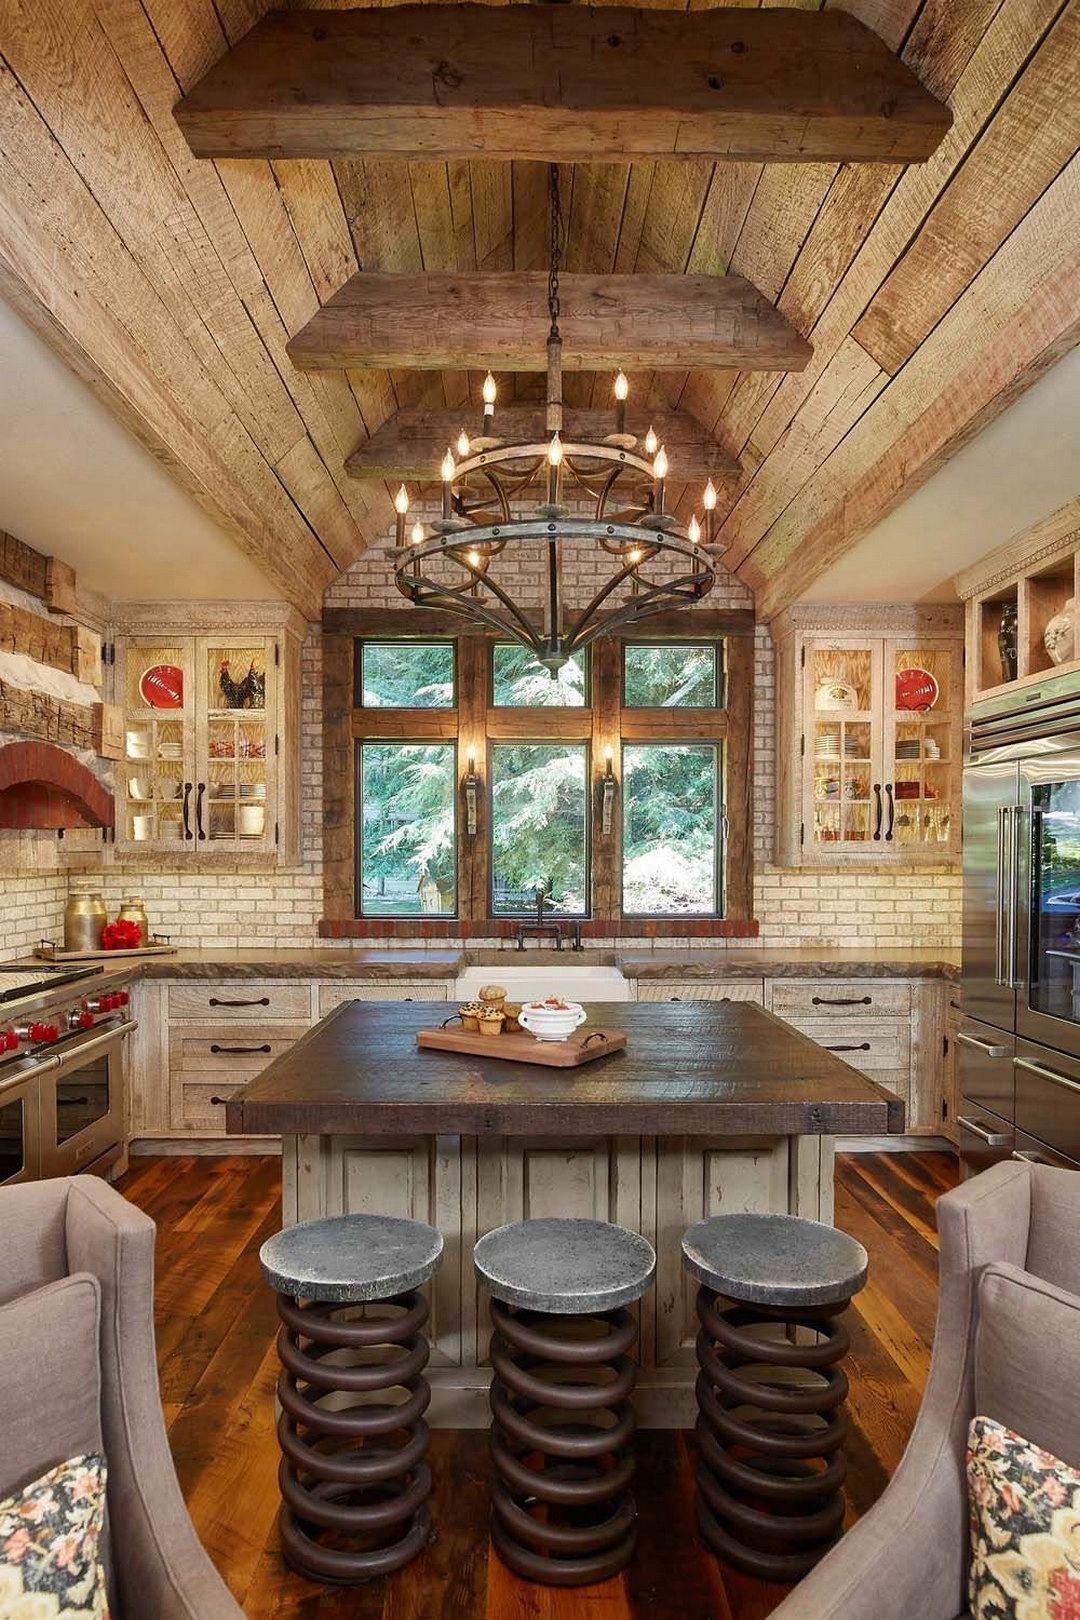 16 Coolest Rustic Decorating Ideas Rustic Modern Kitchen Modern Rustic Decor Rustic Kitchen